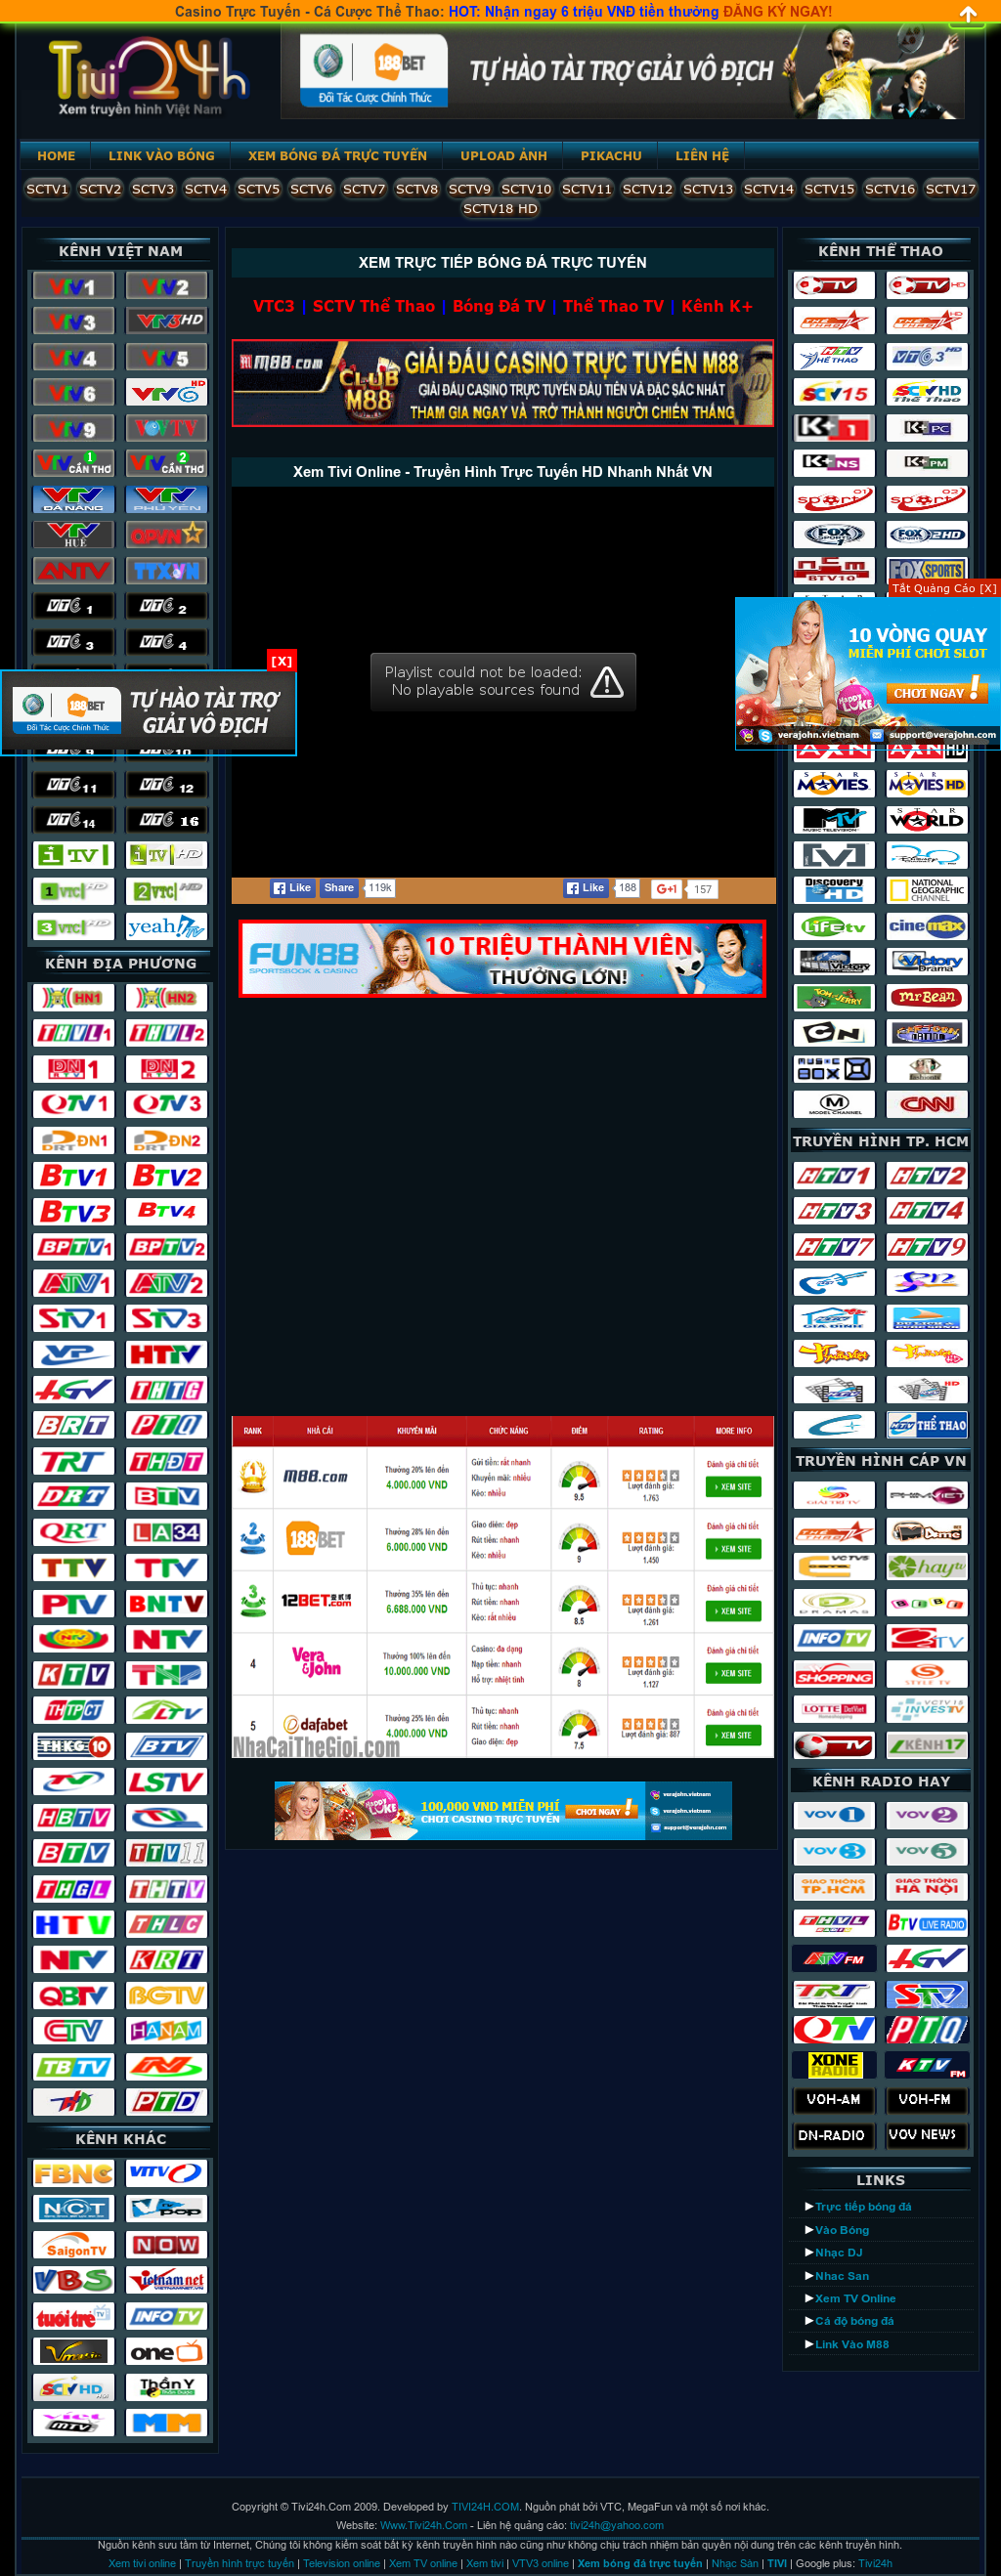 Xem tv la34 online dating